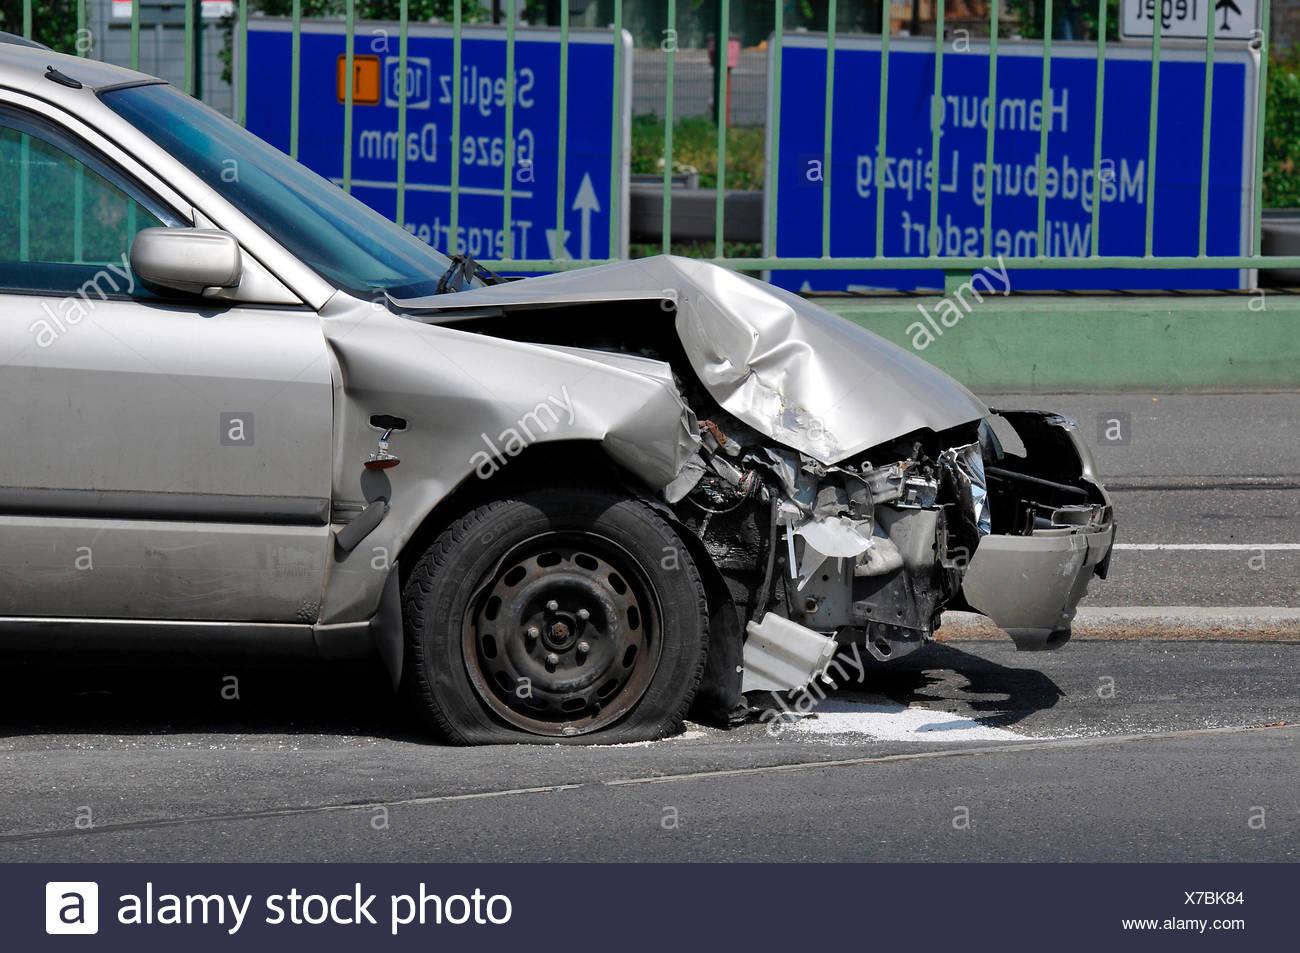 Autounfall Stock Photos & Autounfall Stock Images - Alamy